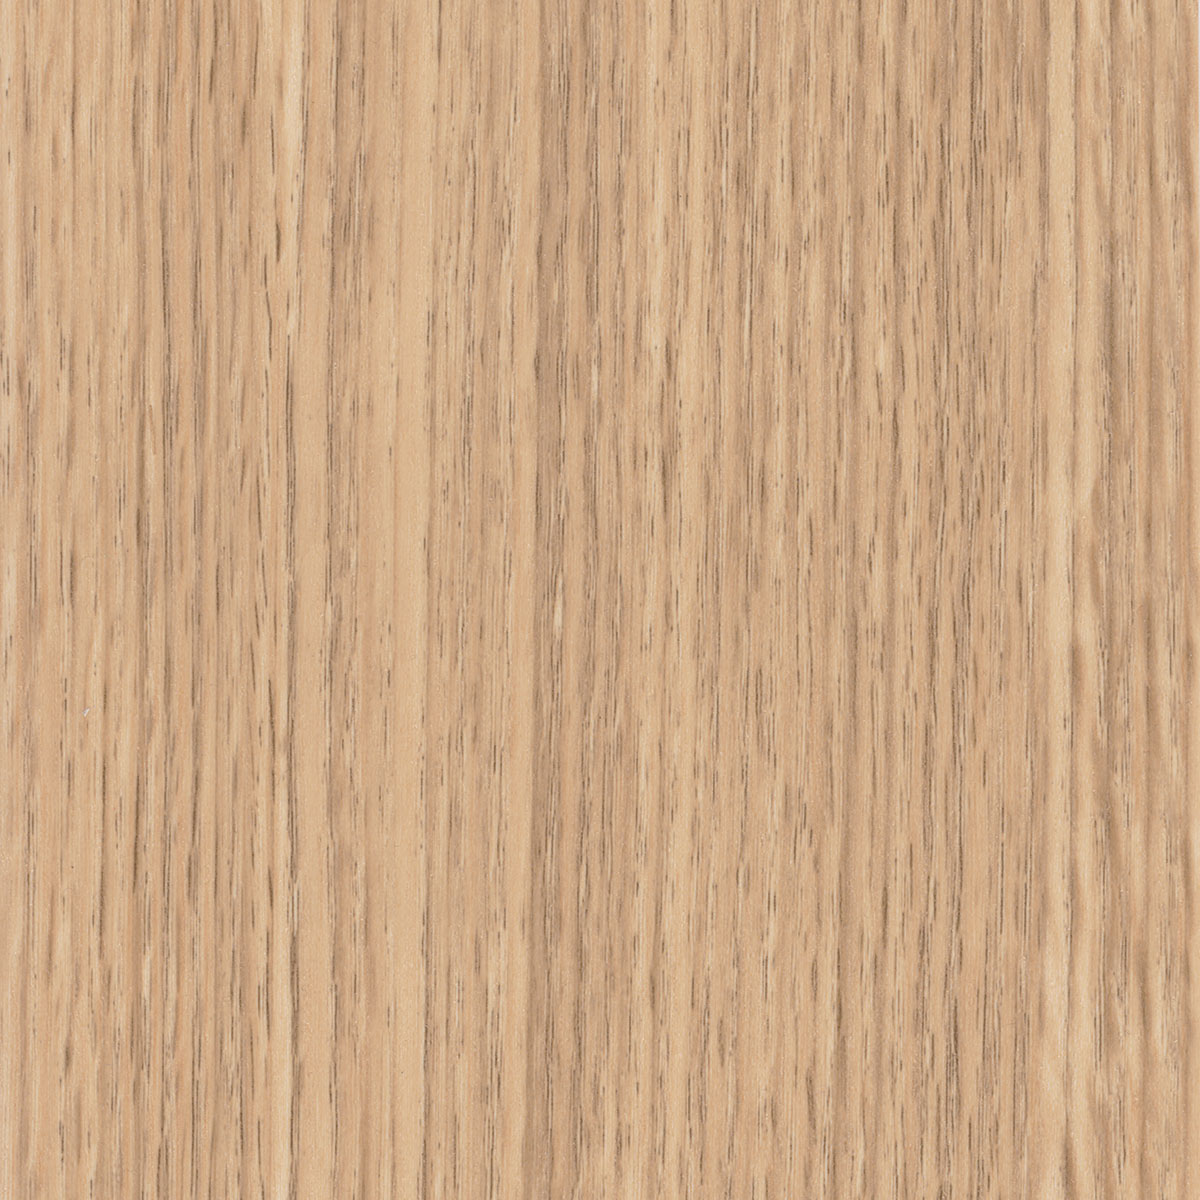 Coated panel PVC code PS-128083